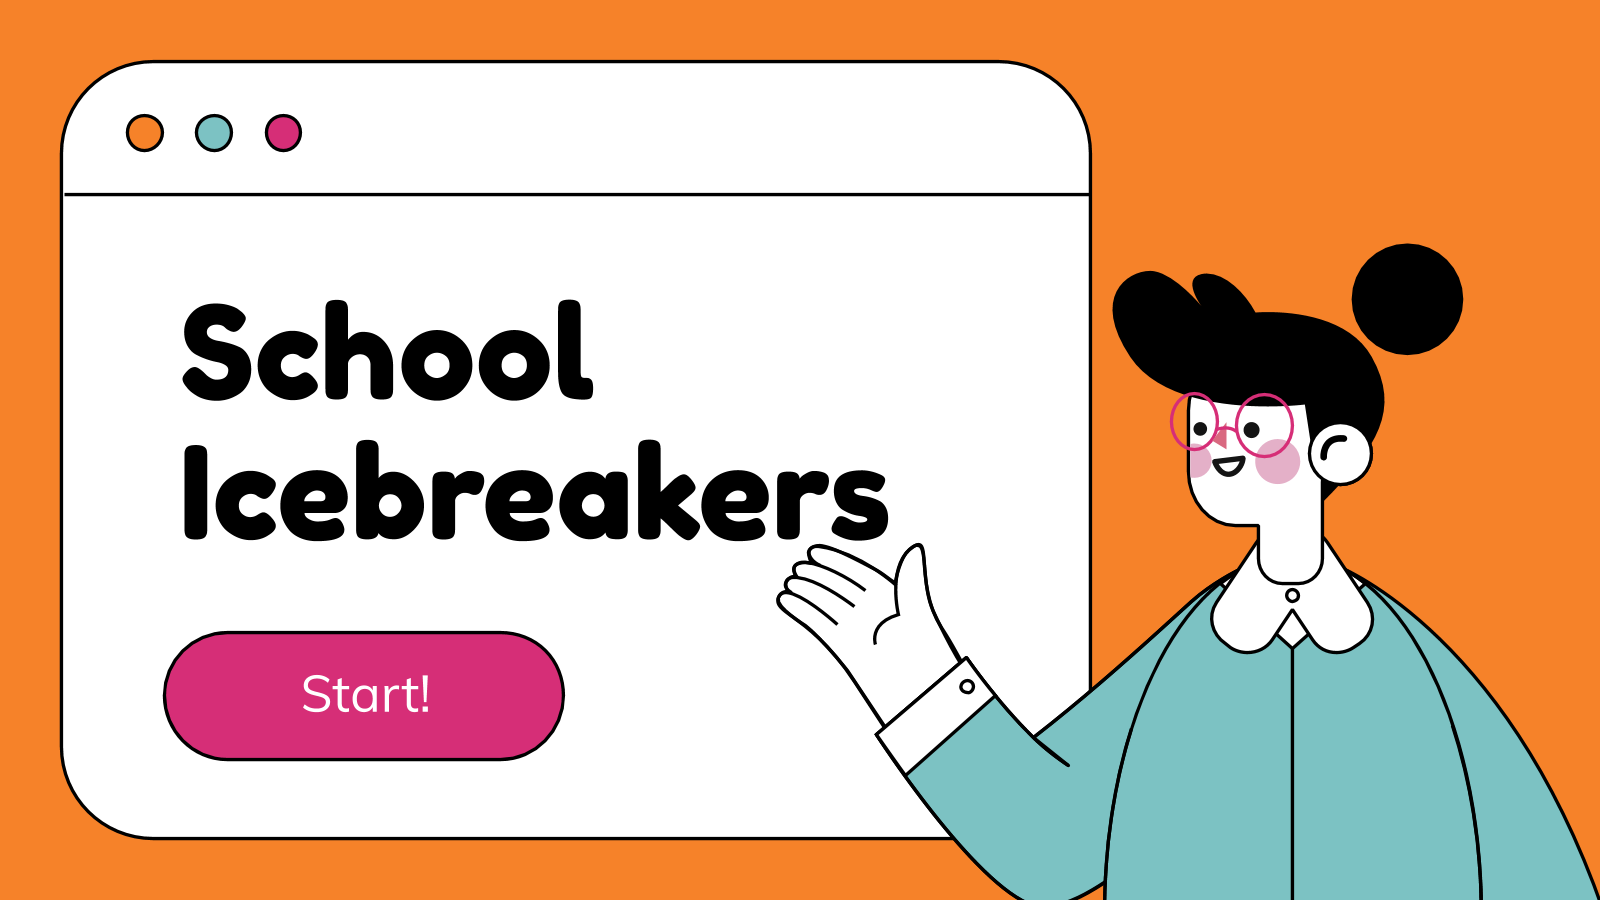 School Icebreakers presentation template